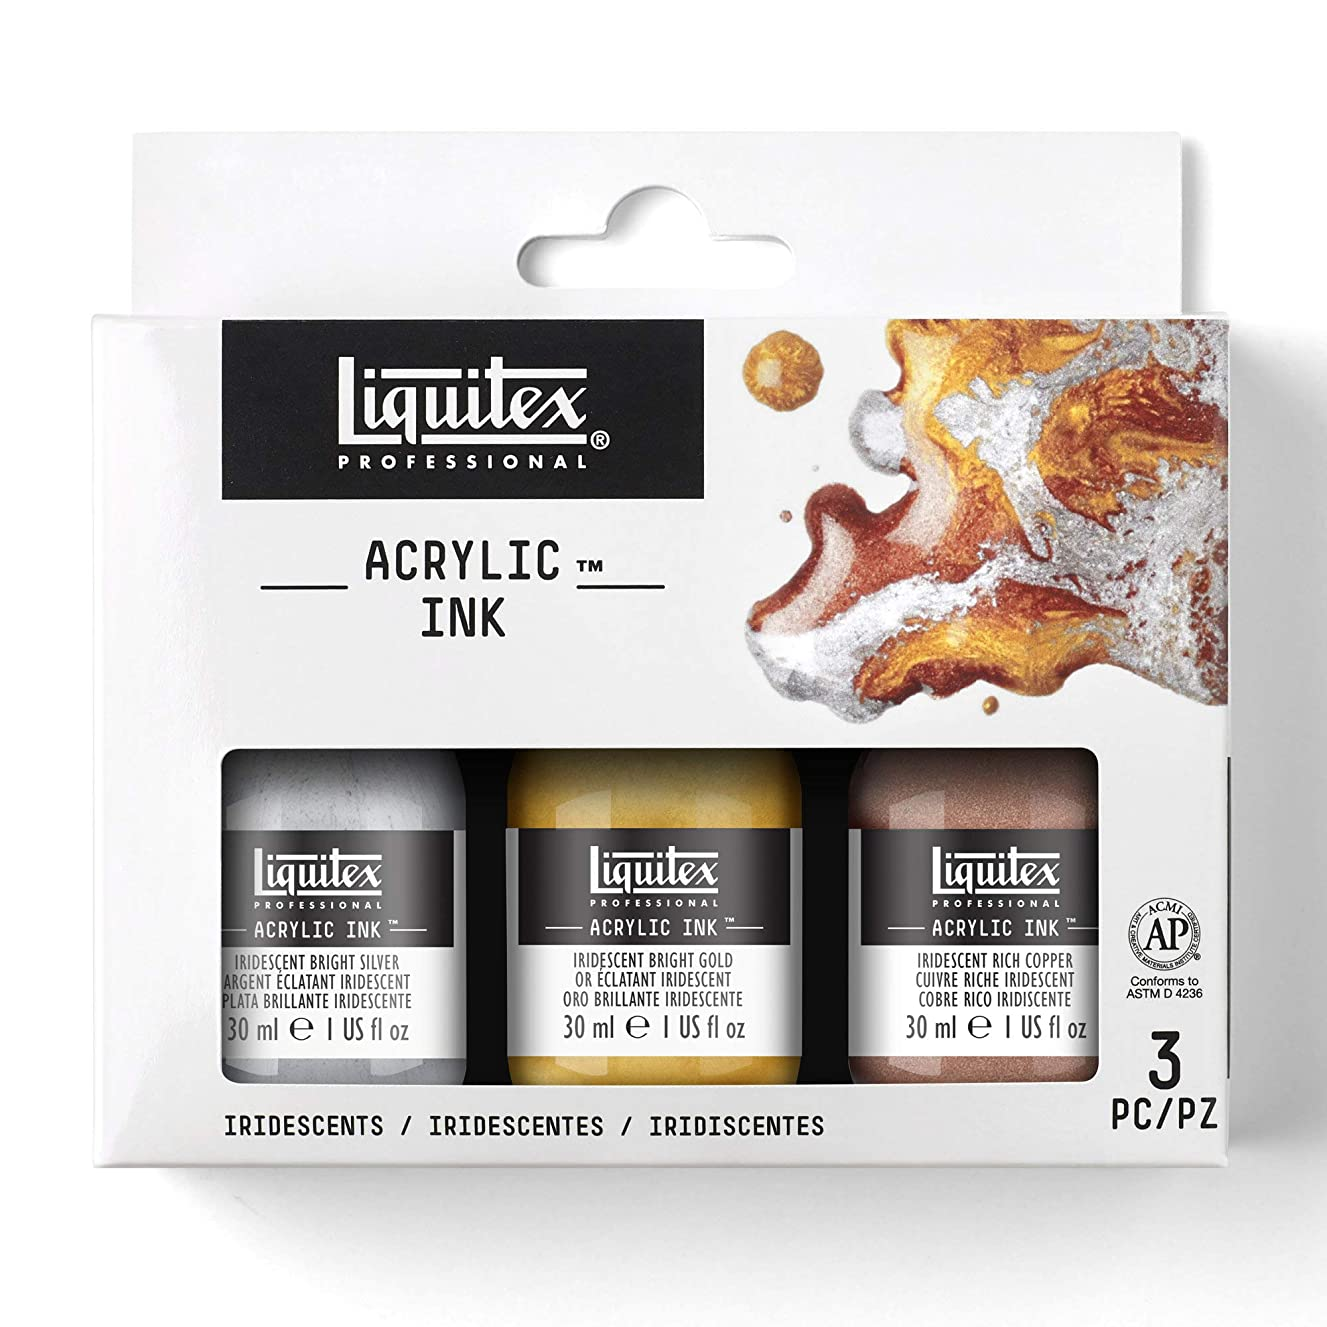 Liquitex Professional Acrylic Ink, Iridescent Set